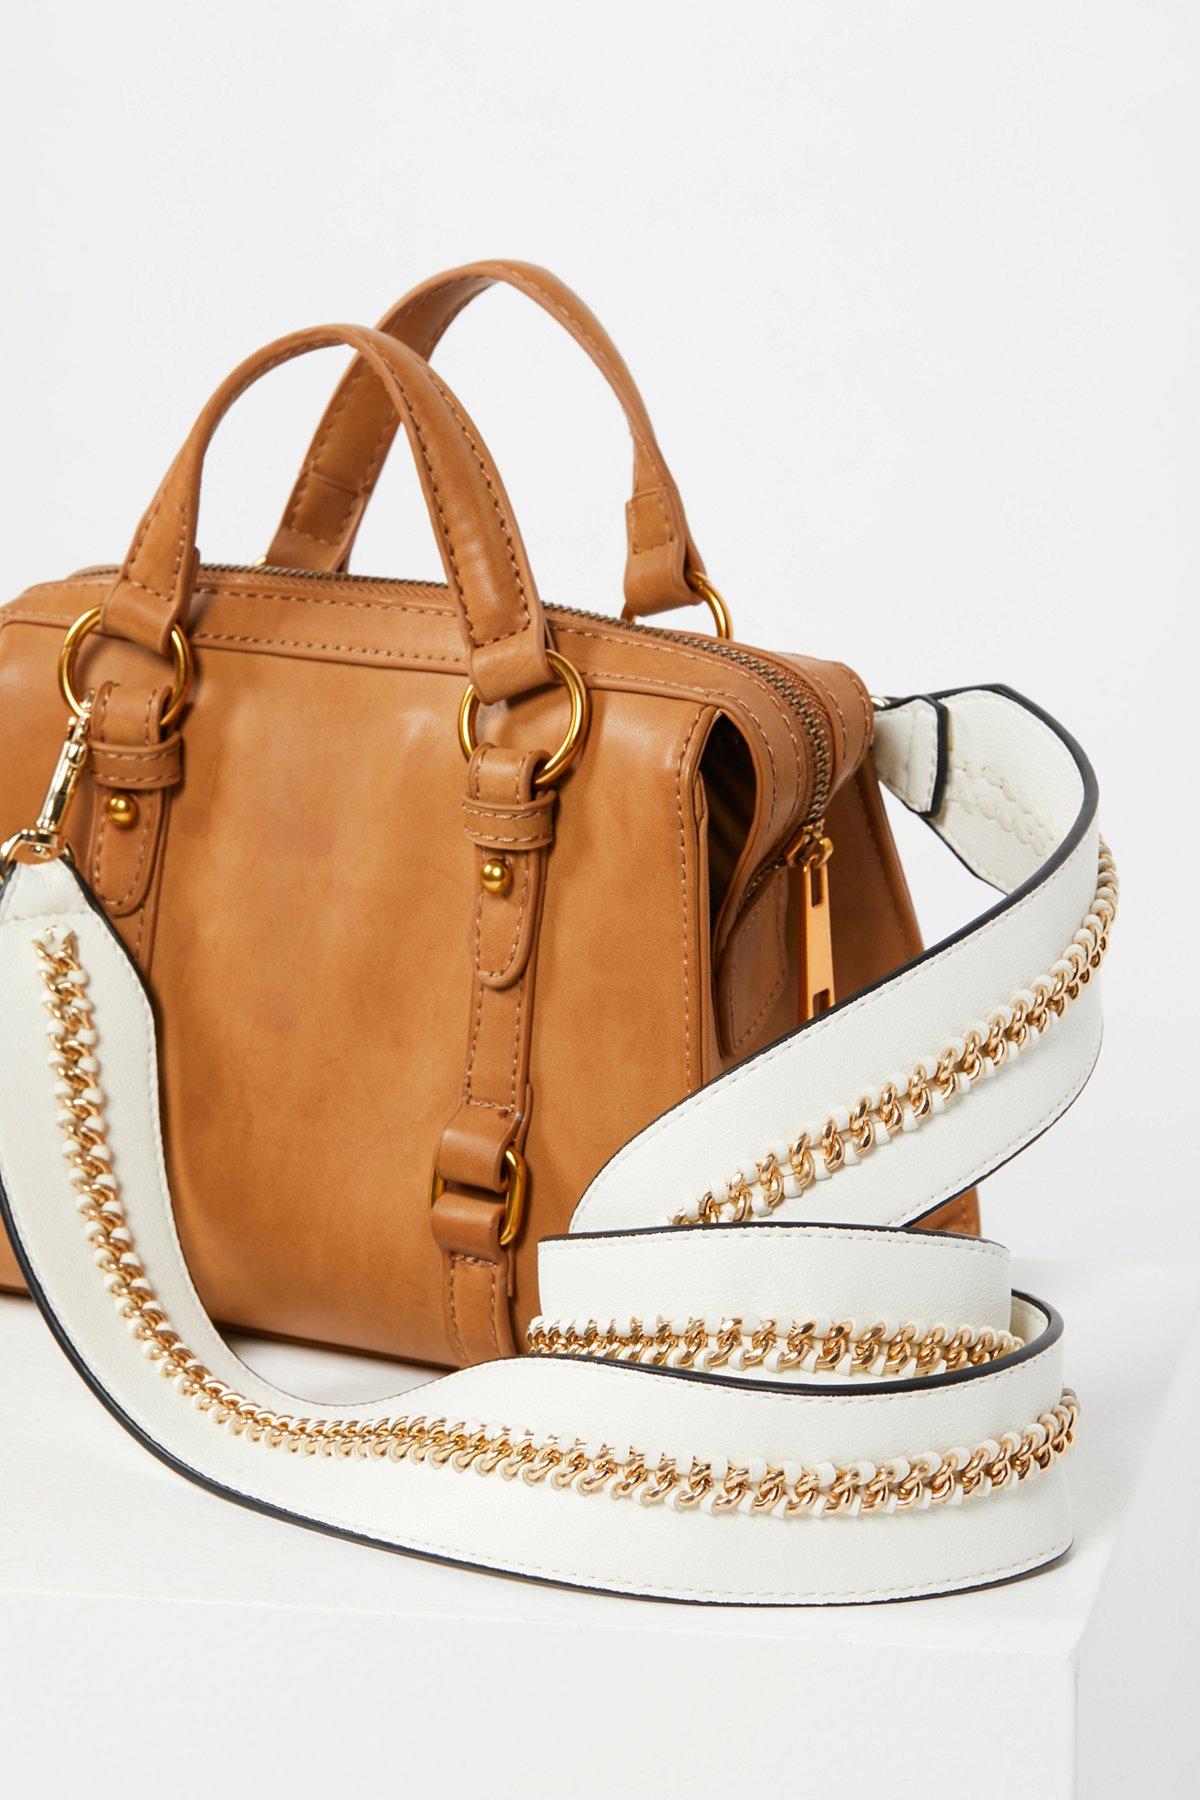 Vegan Chain Bag Strap